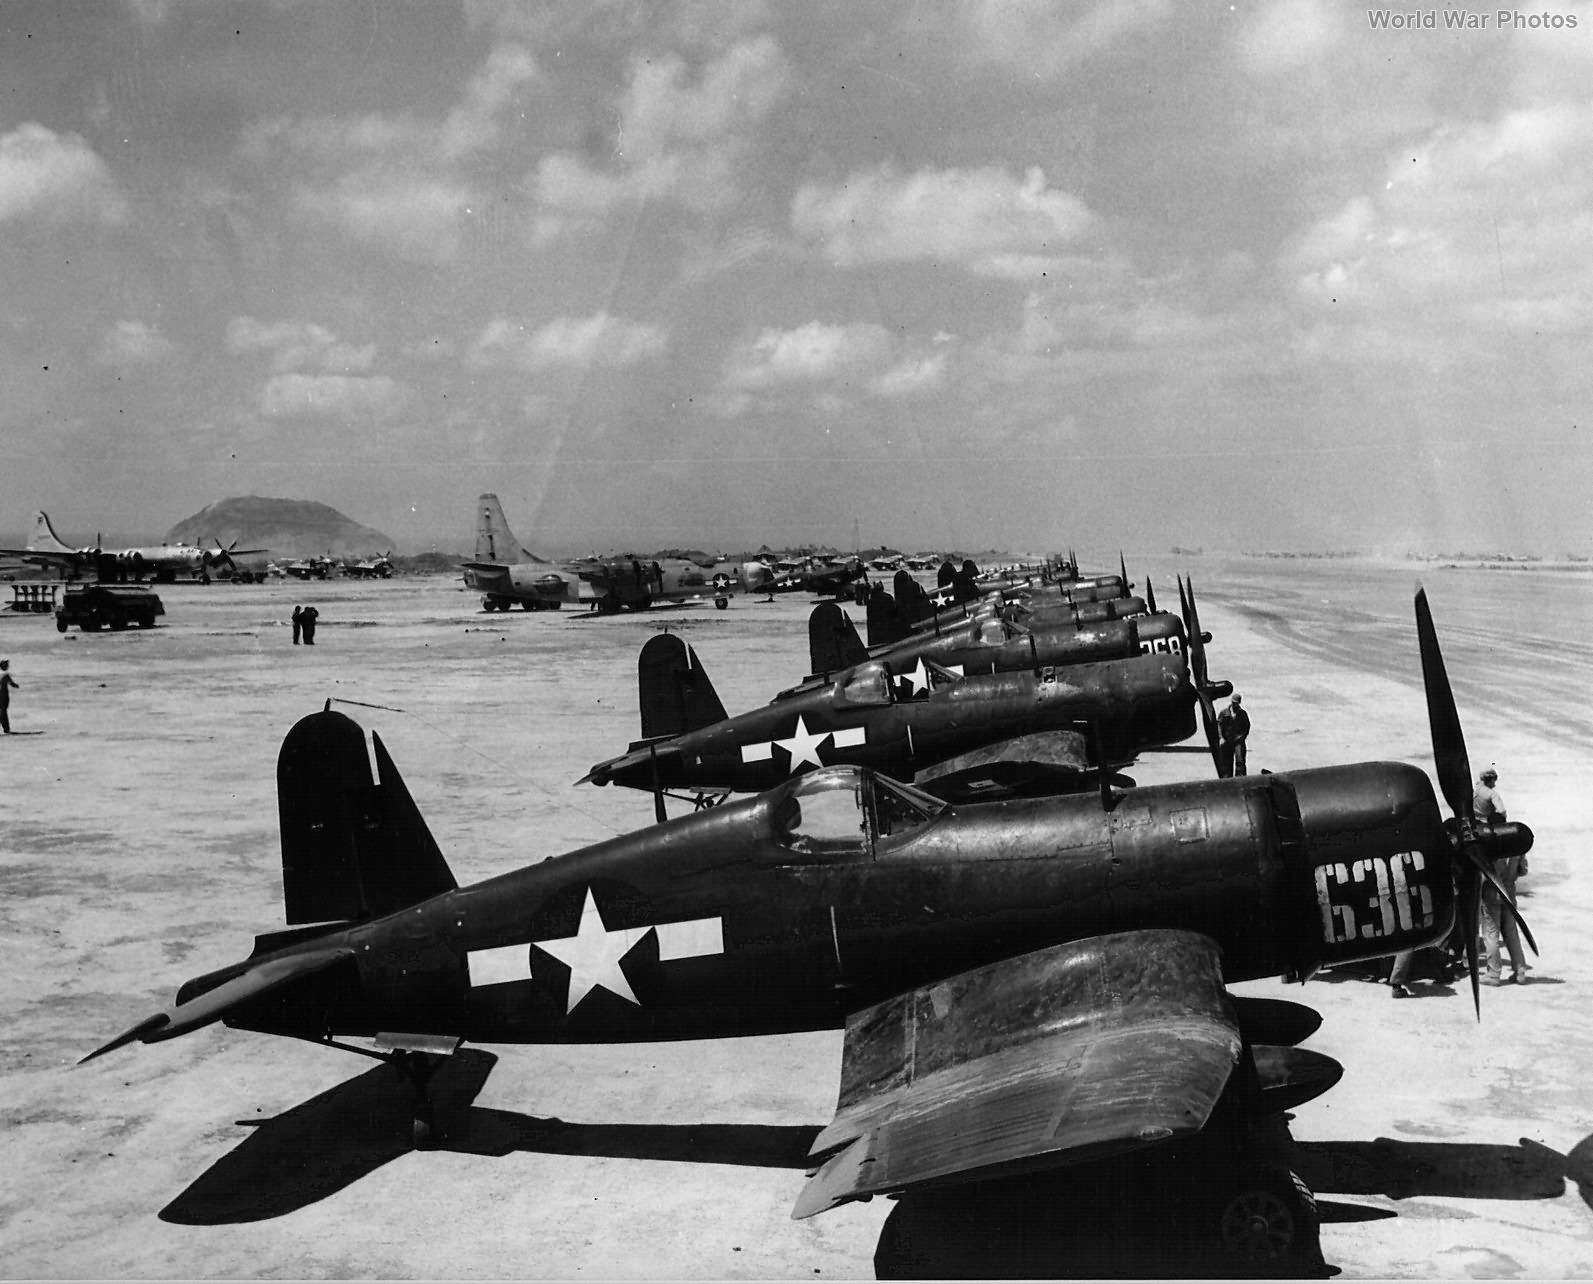 FG-1D of the MAW-4 at Iwo Jima 1945